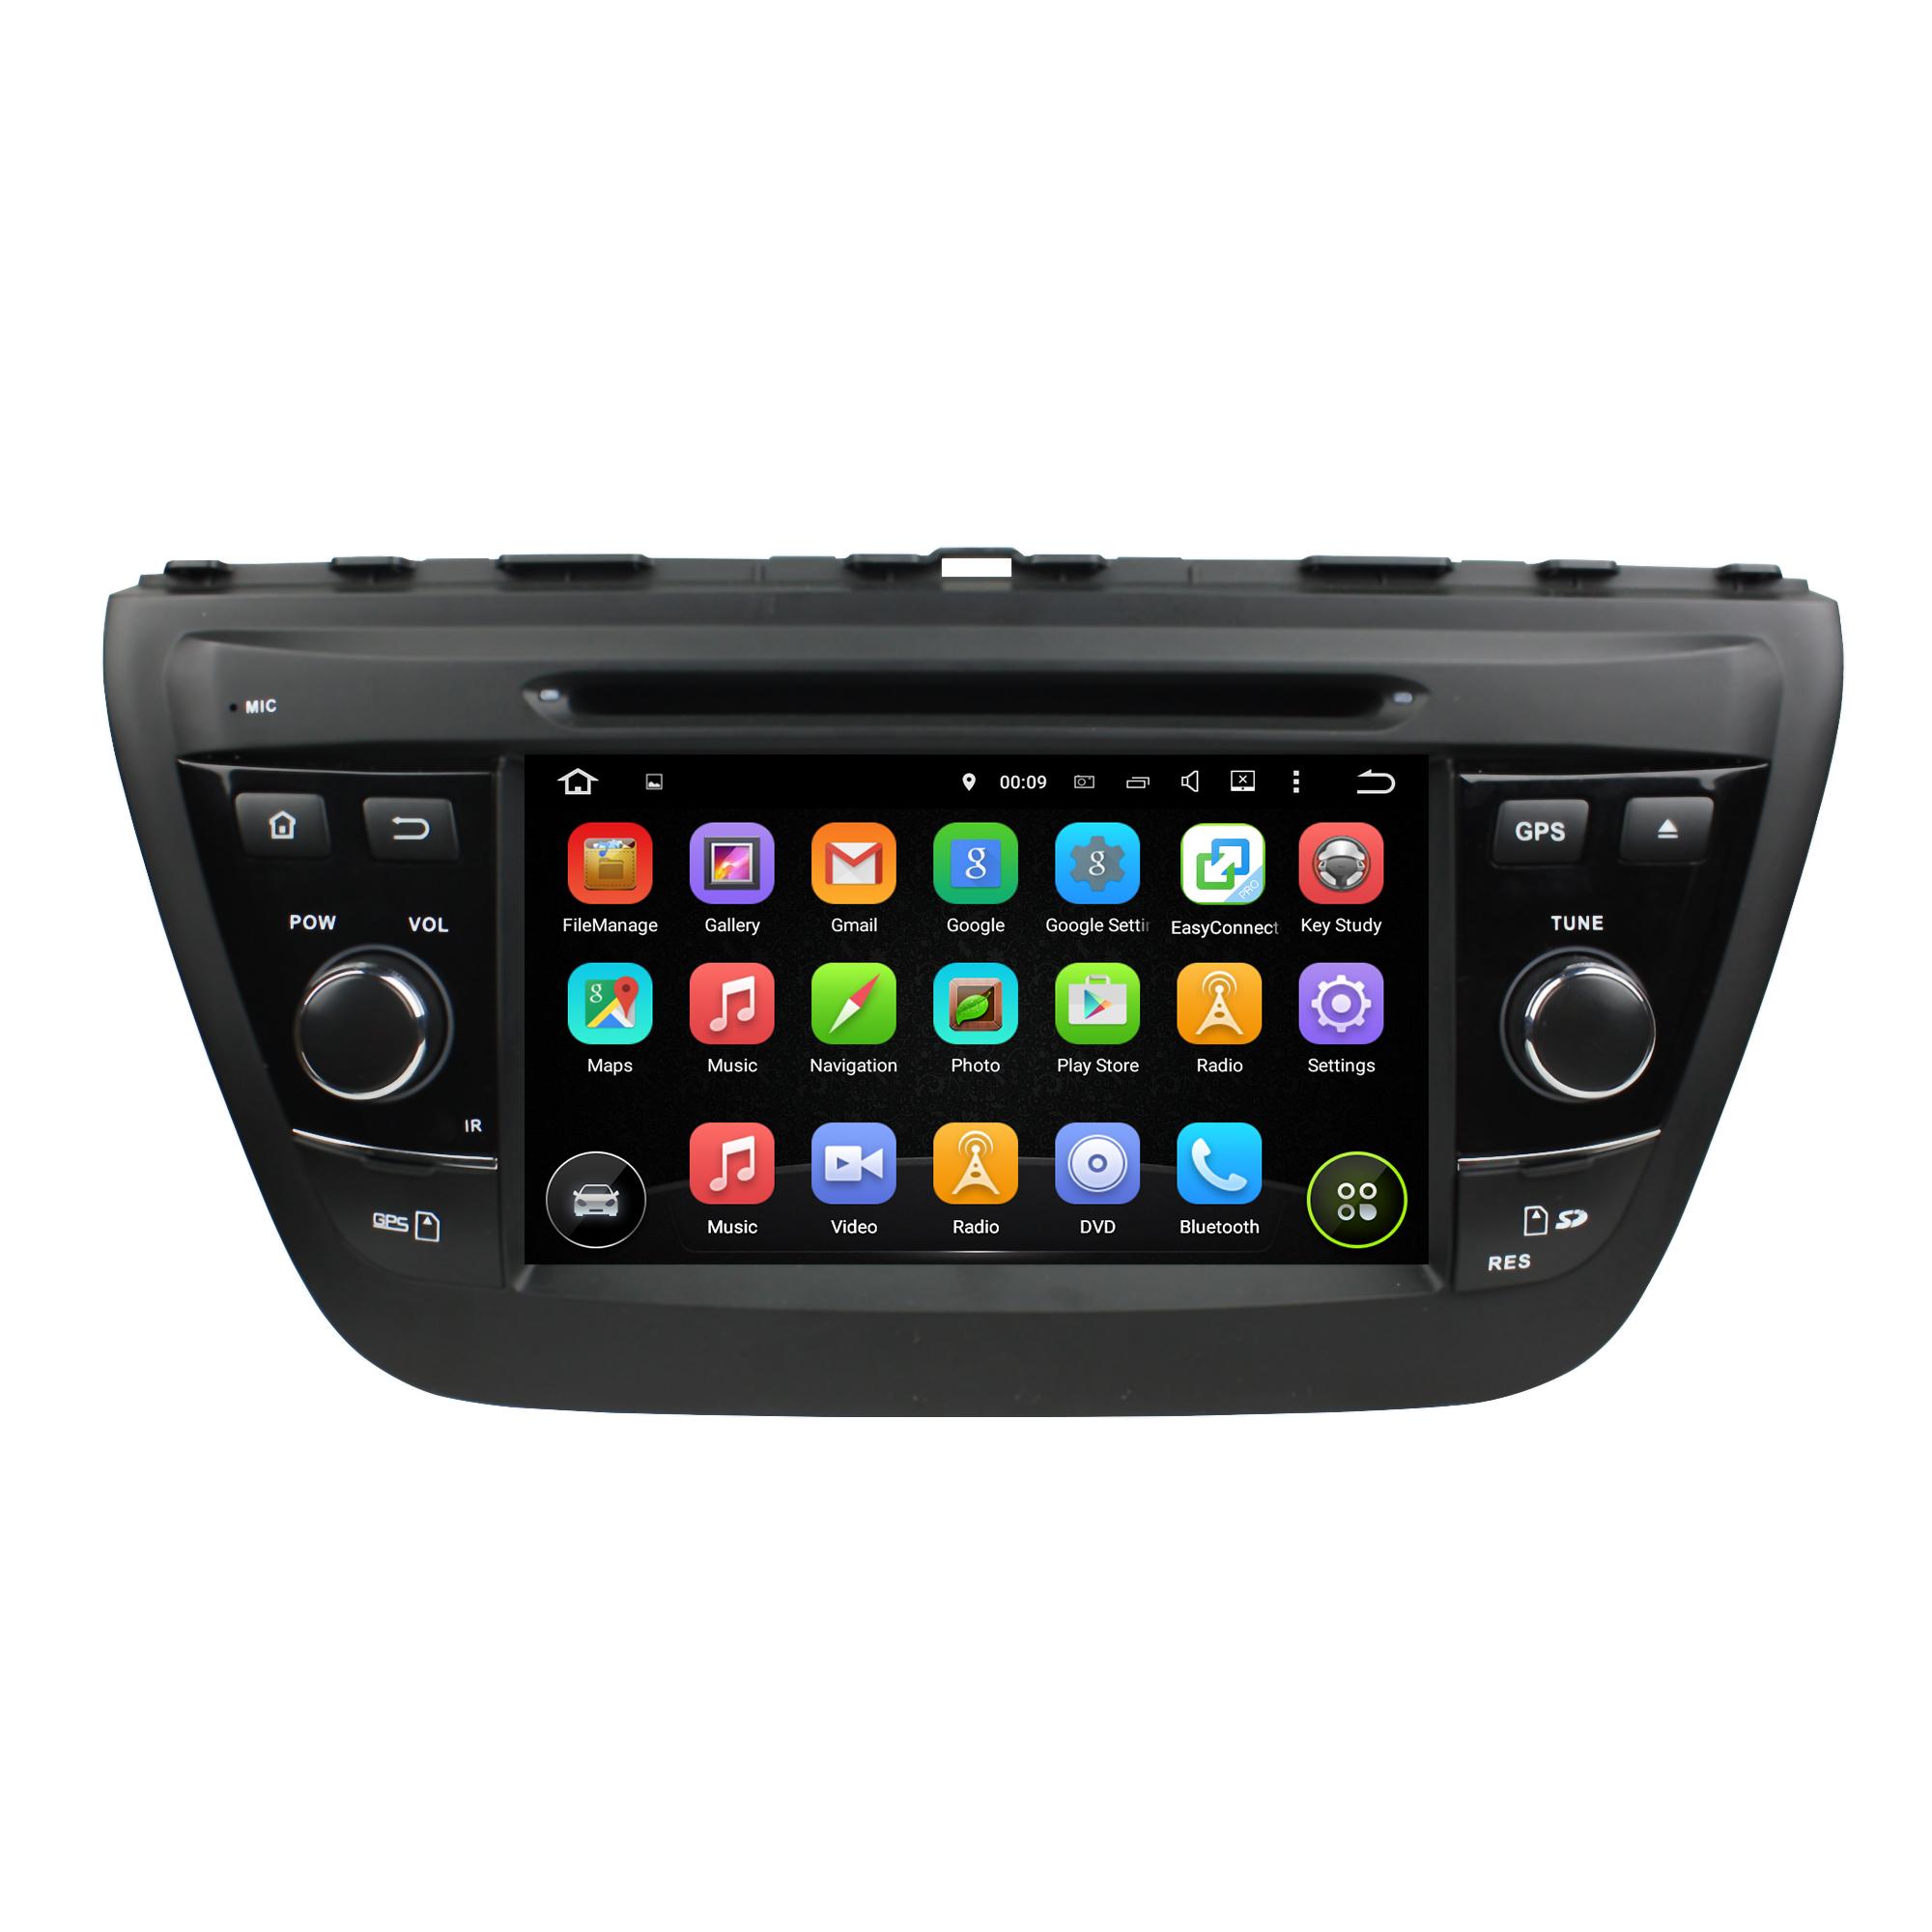 Android 5.1 car DVD for Suzuki SX4 2014